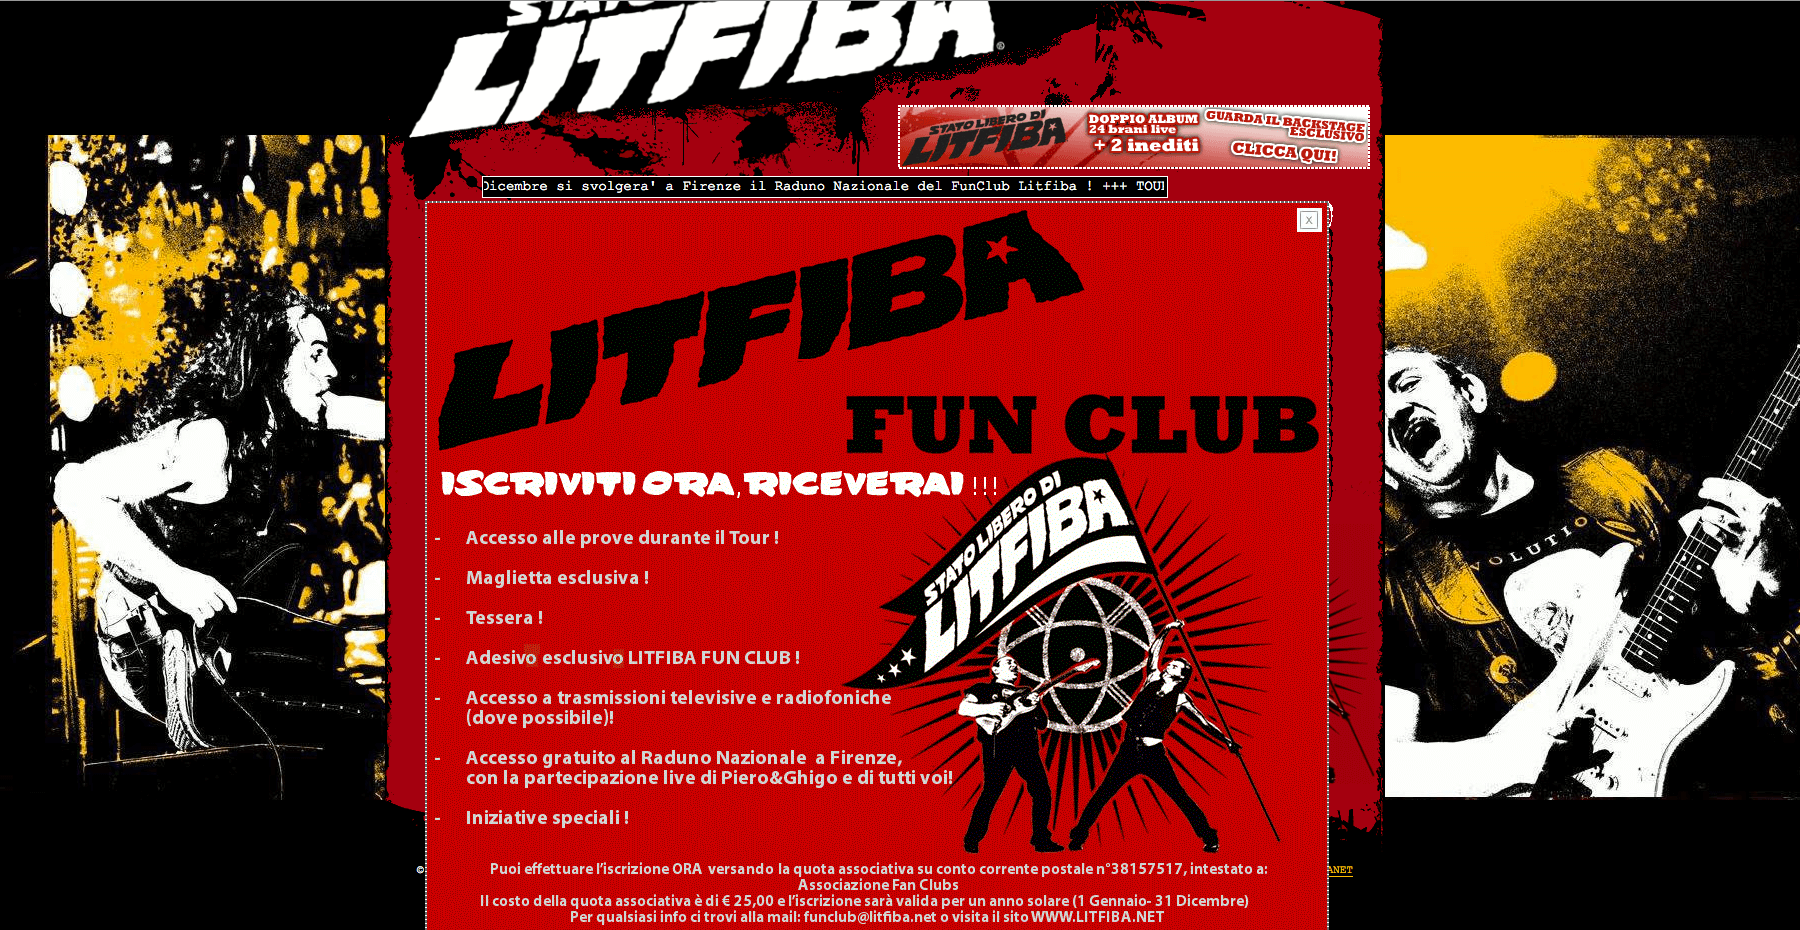 Litfiba_FunClub_2011